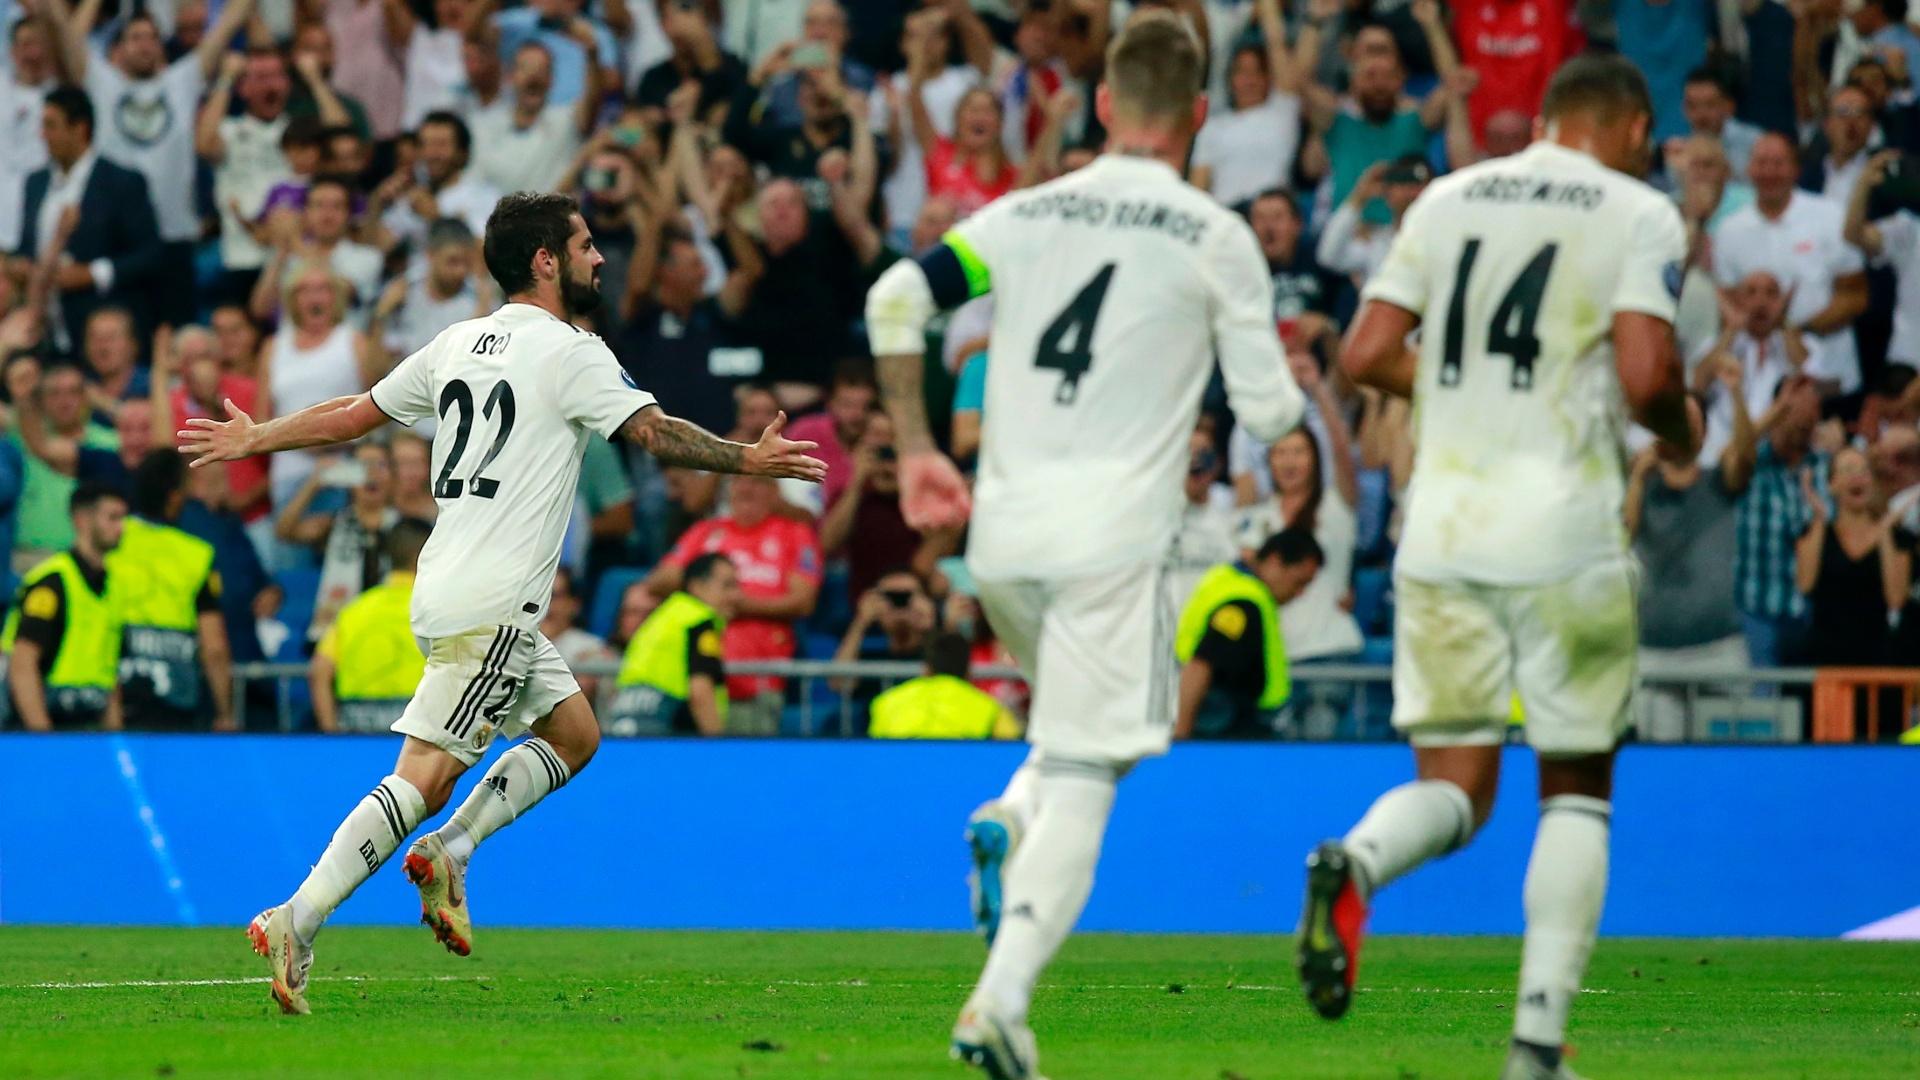 Isco comemora gol do Real Madrid sobre a Roma